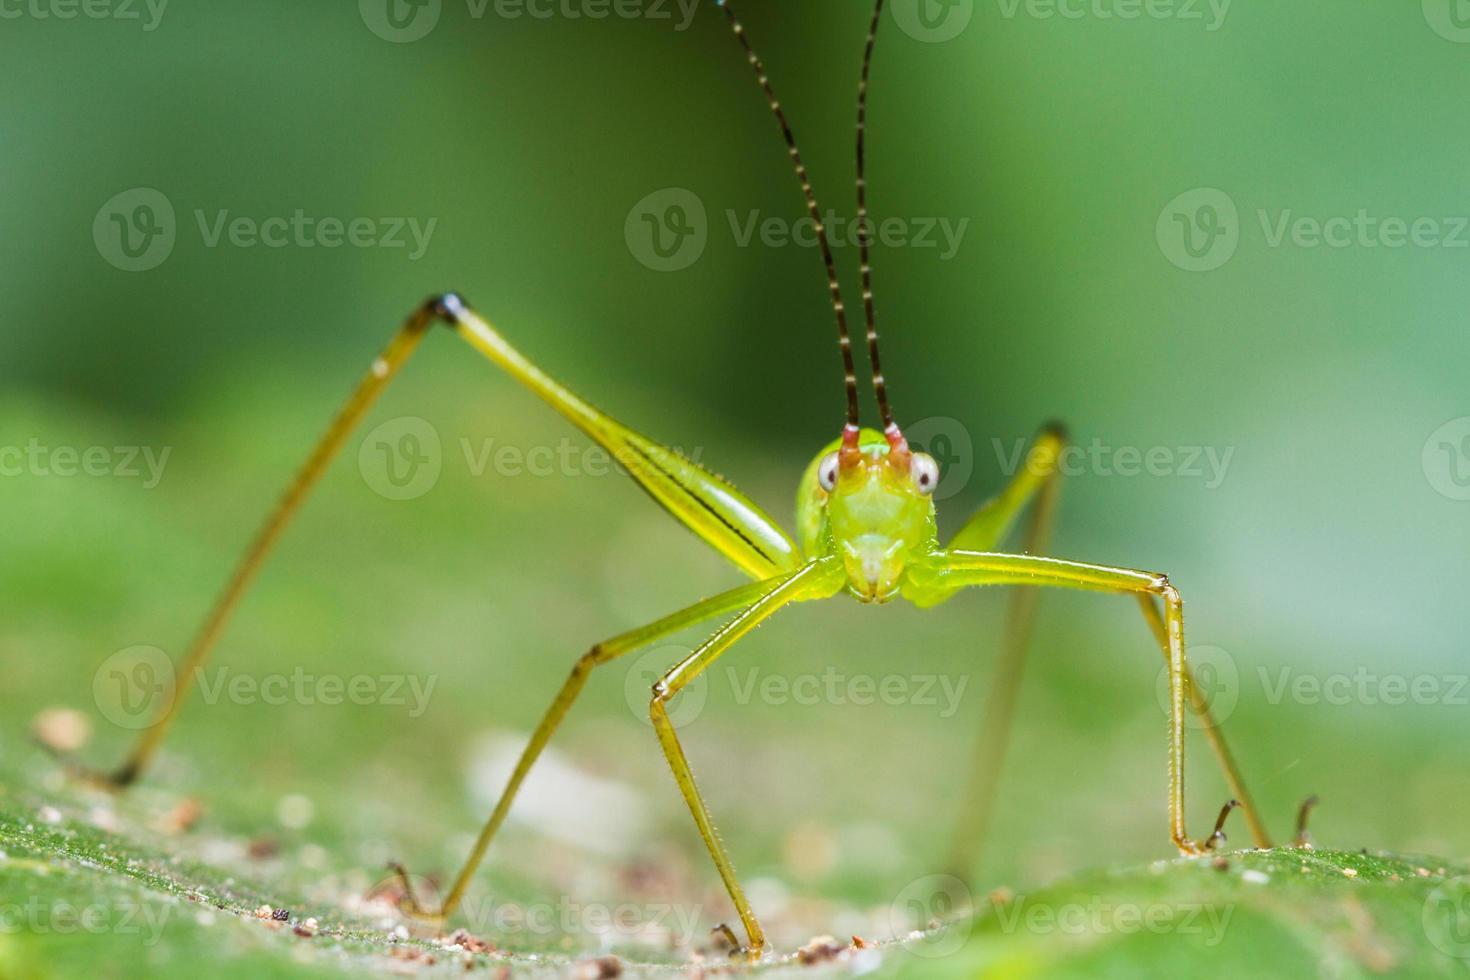 pequena folha verde katydid foto